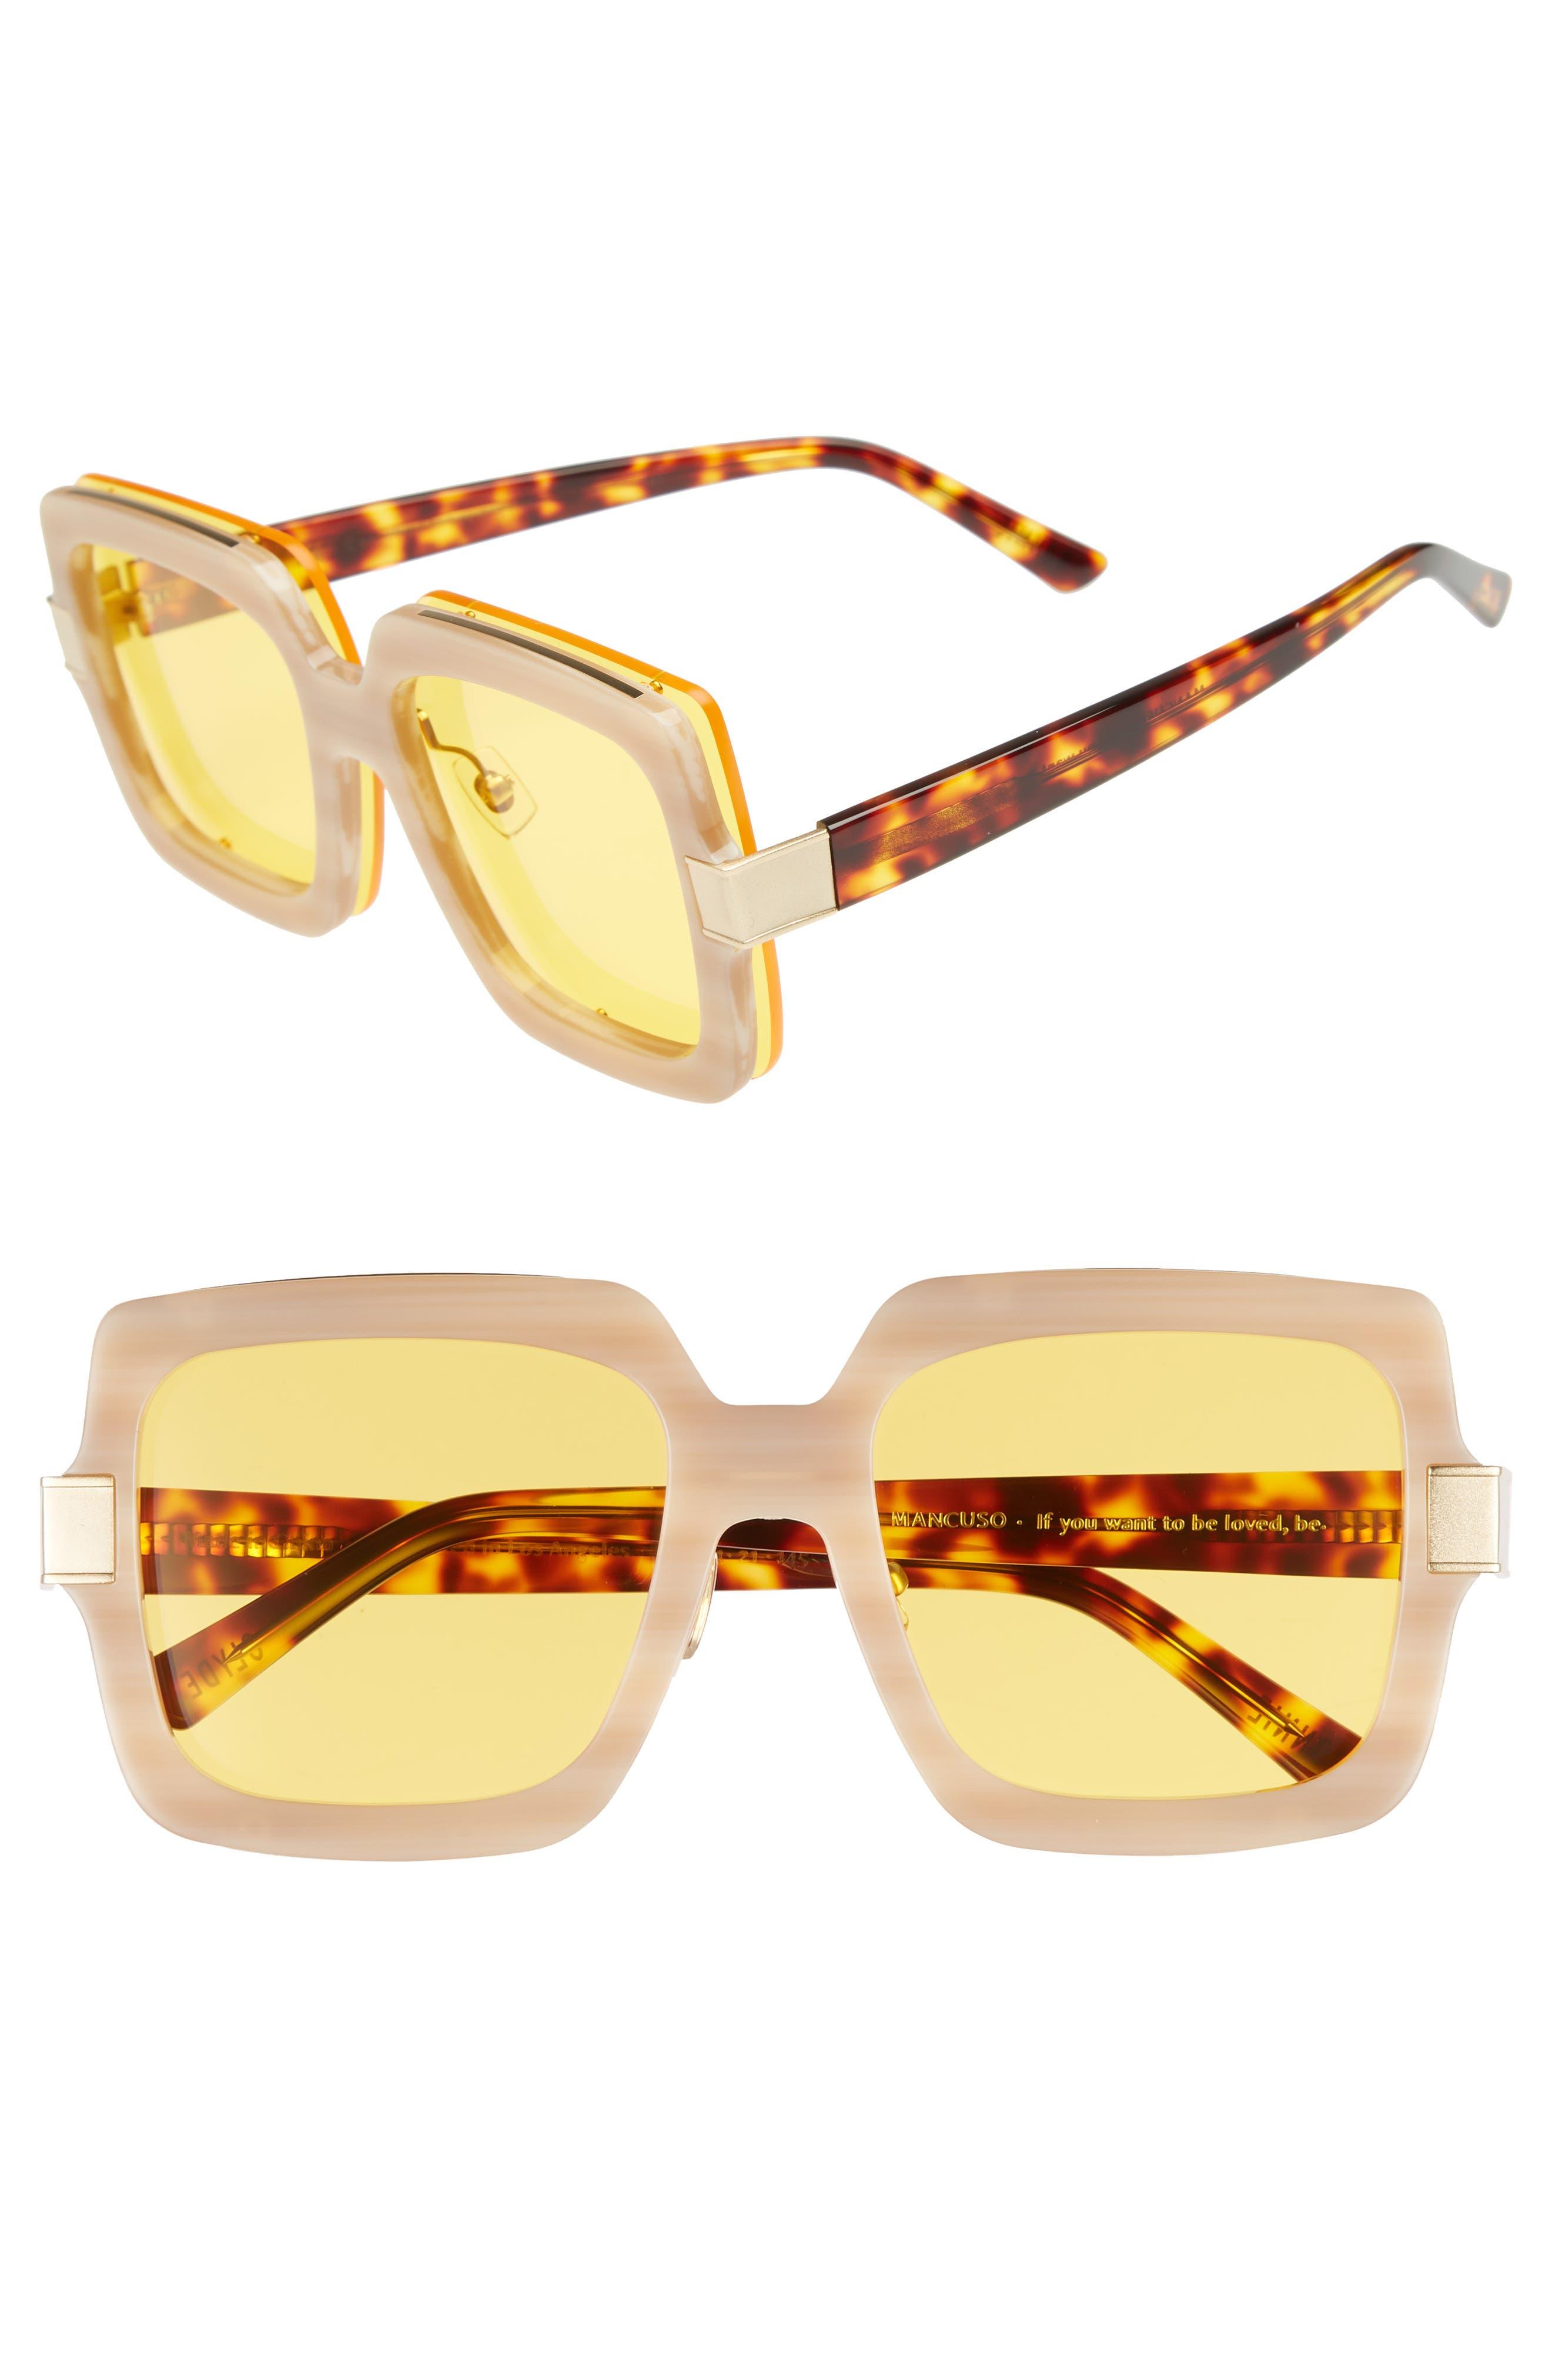 Mancuso 54mm Sunglasses,                         Main,                         color, Red Elm/ Yellow